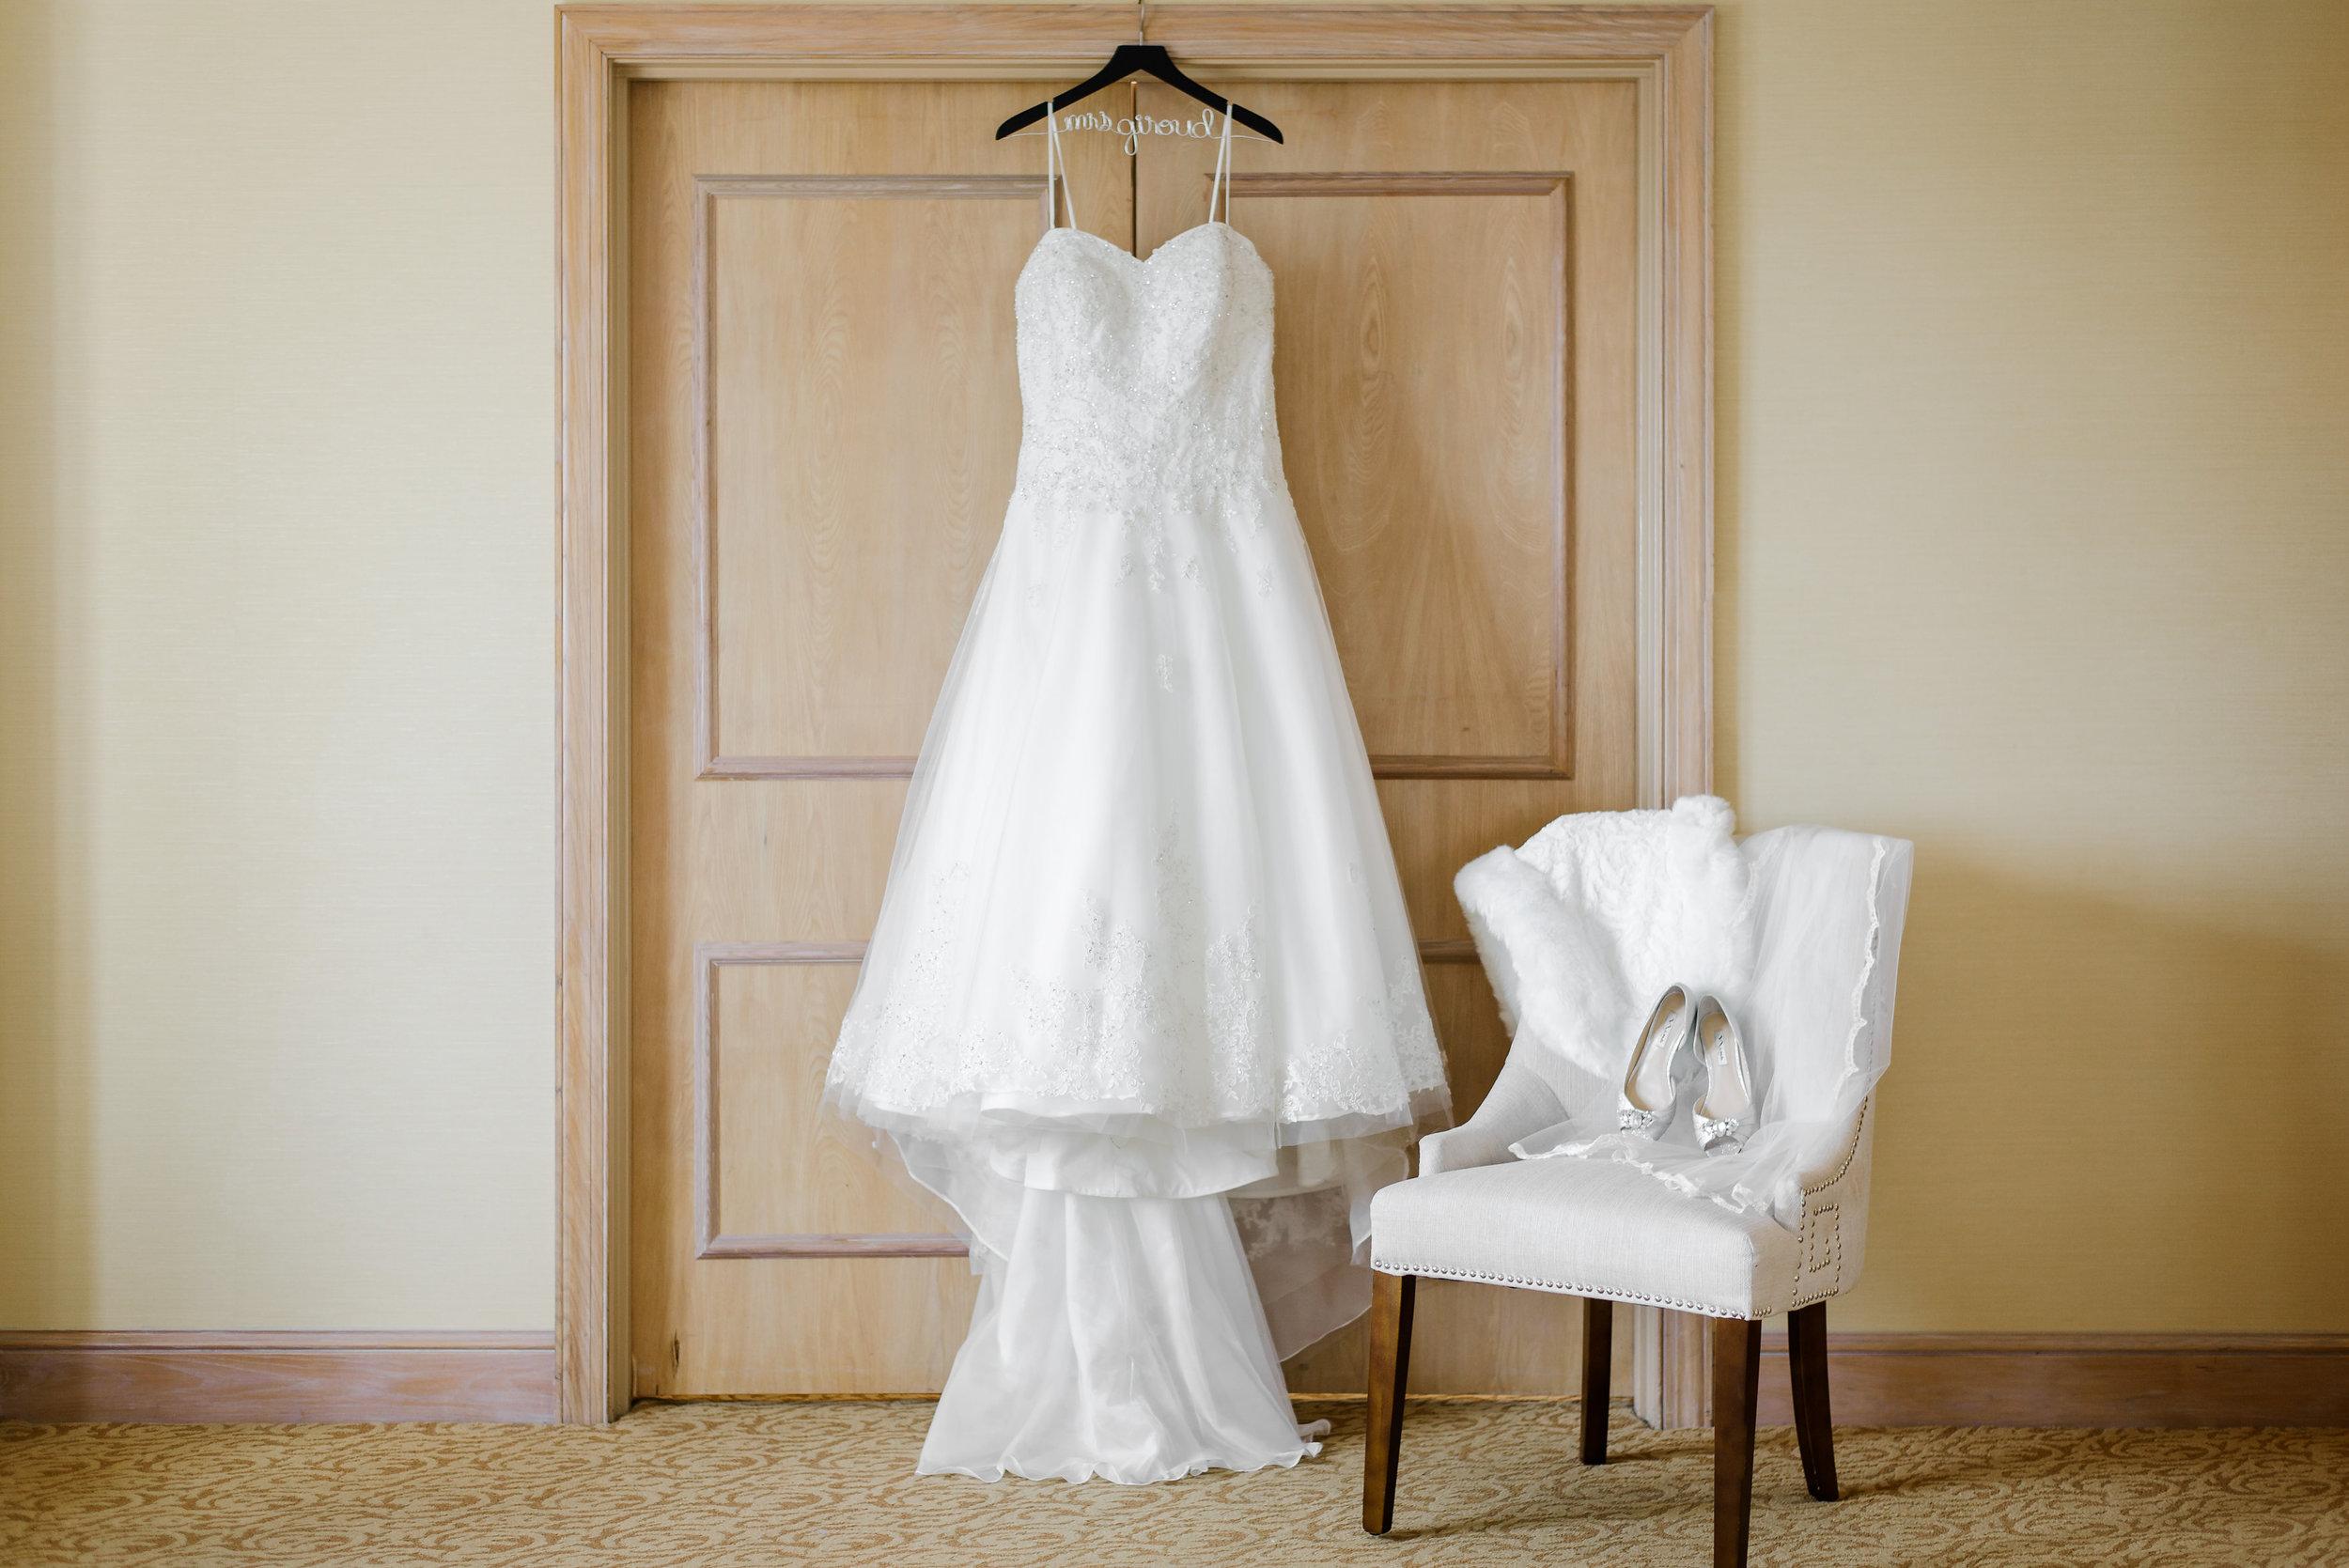 winsor event studio wedding dress hanging shot